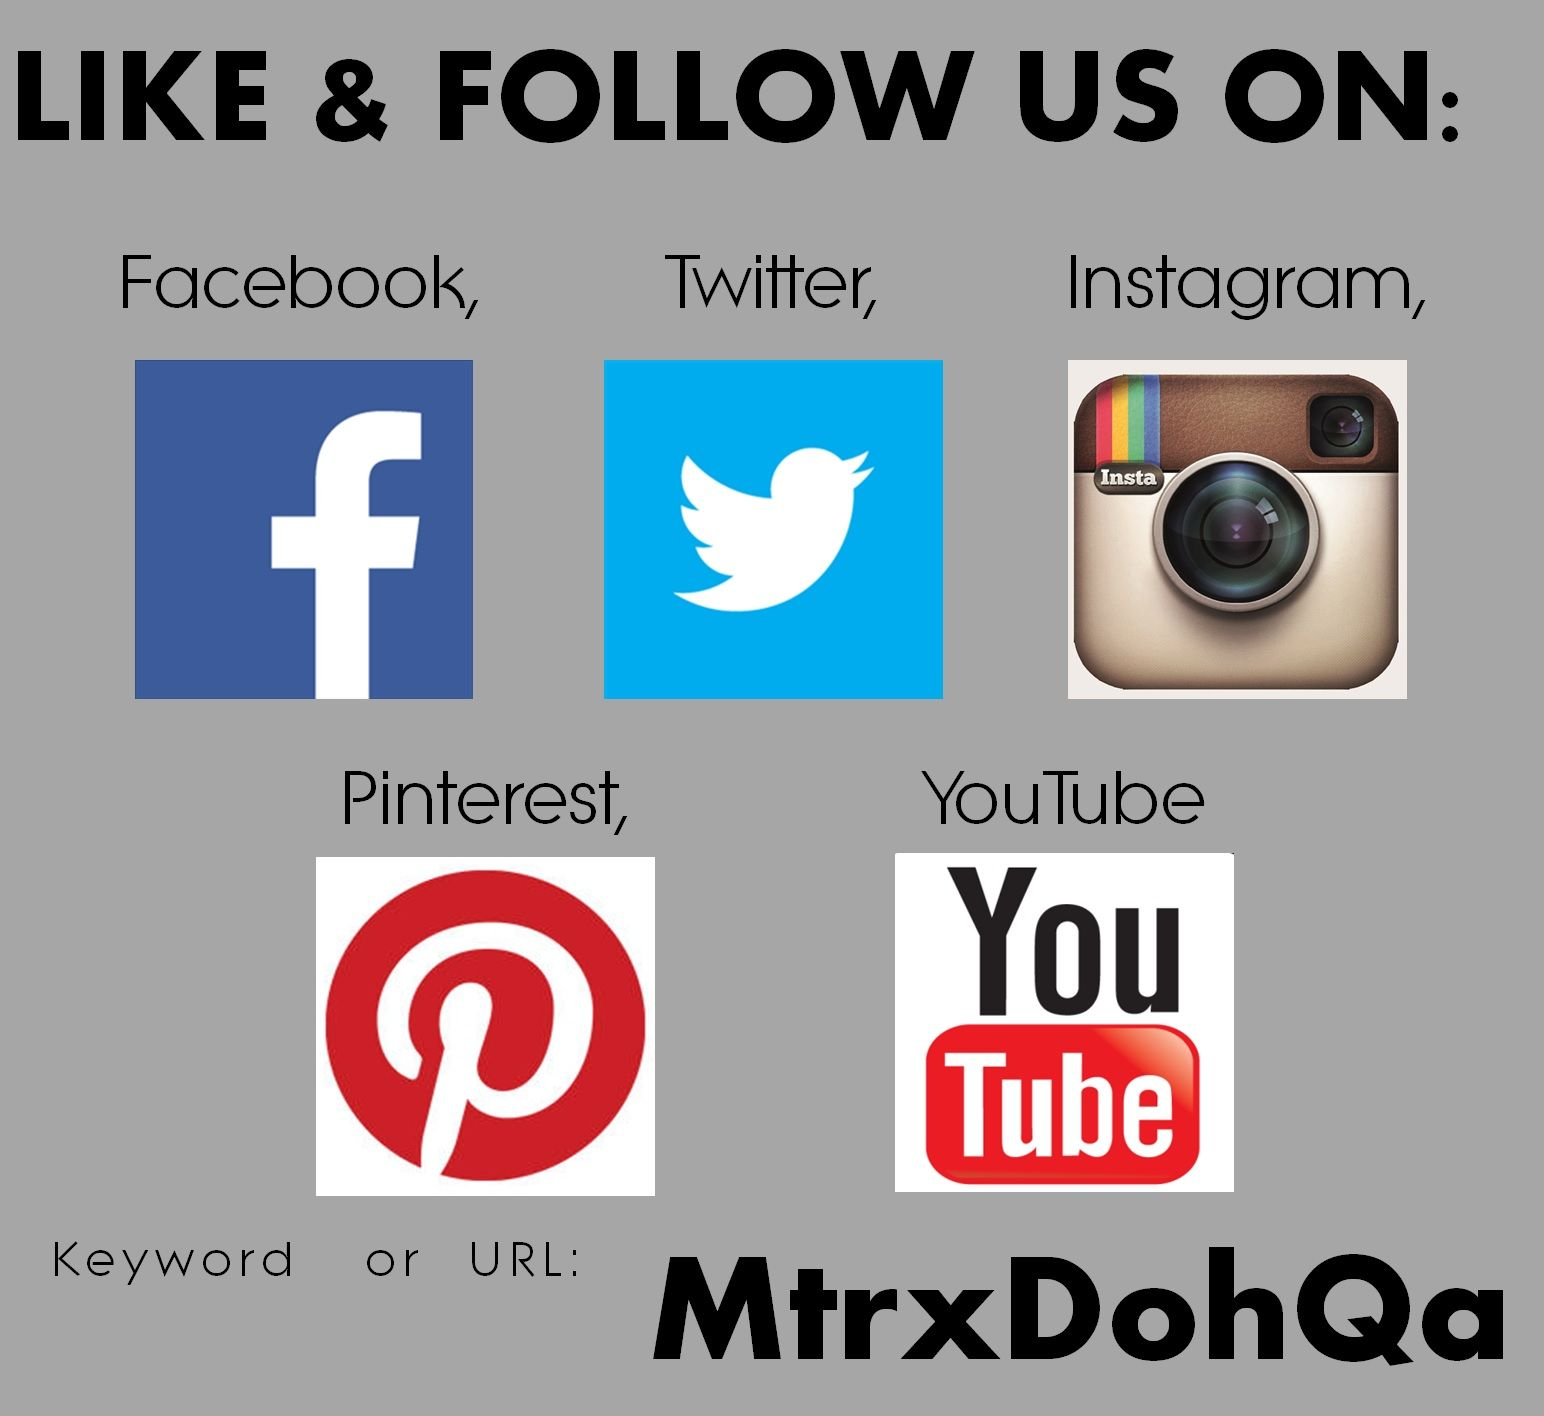 Like Follow Us On Facebook Twitter Instagram Pinterest Youtube Keyword Mtrxdohqa Youtube Twitter Instagram Instagram